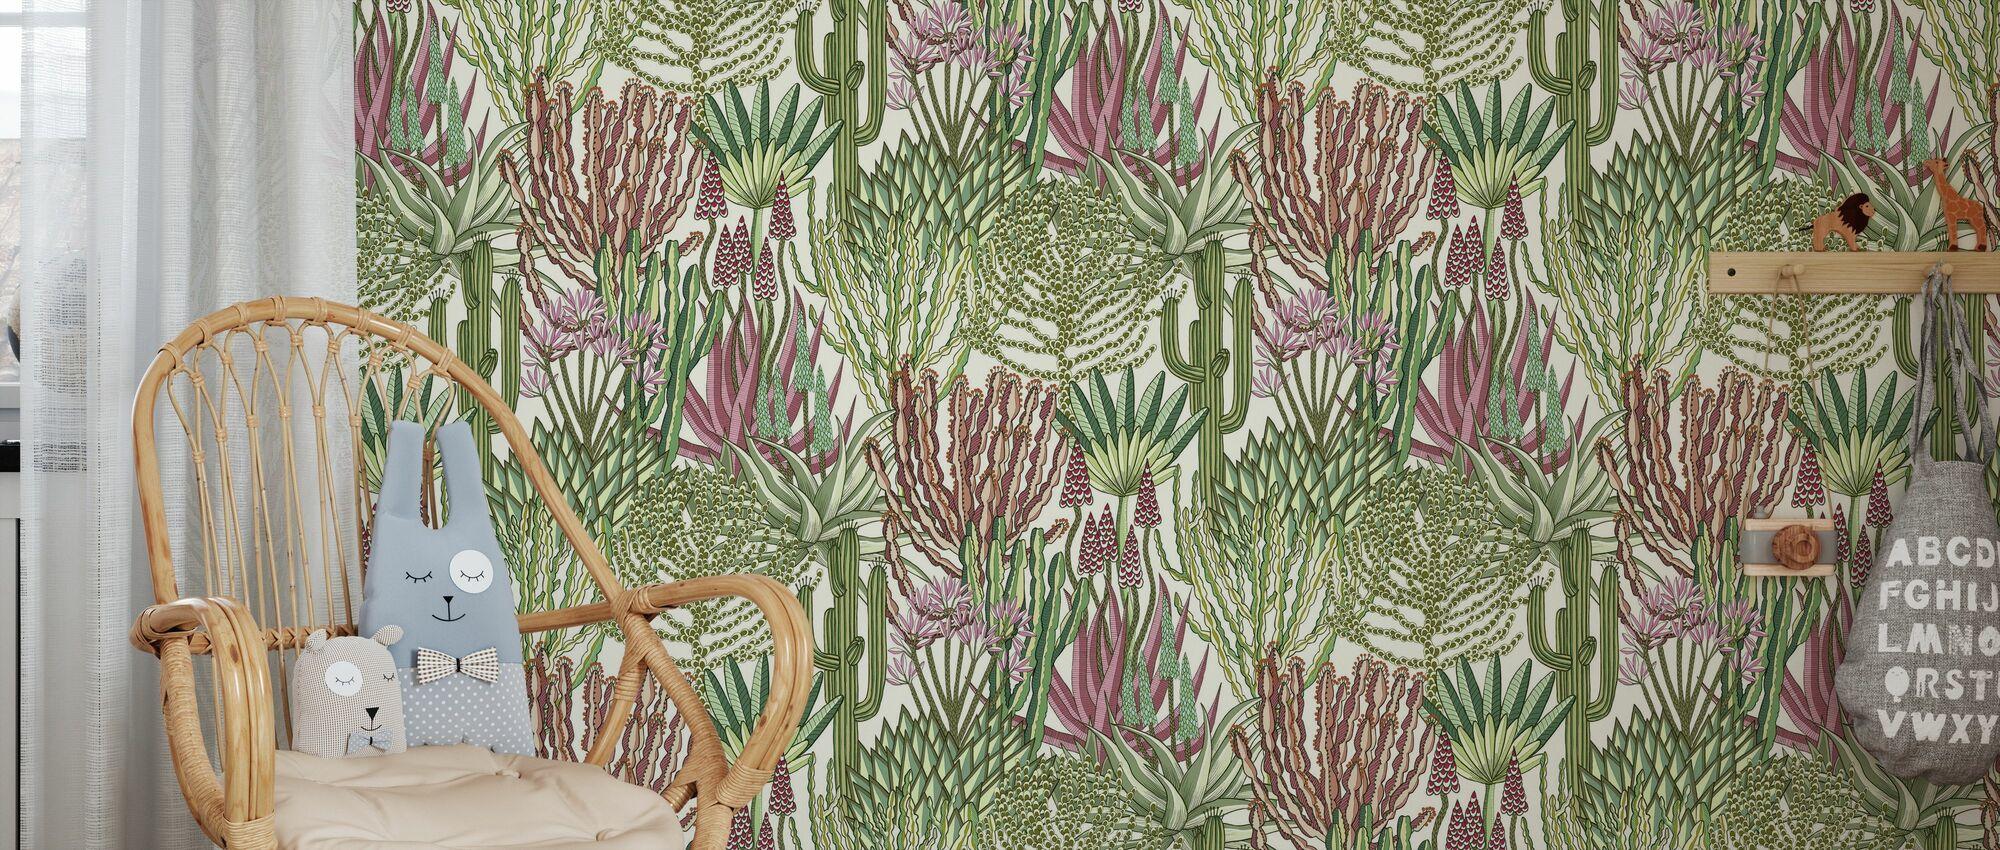 Euphorbia Forest - Paradise - Wallpaper - Kids Room